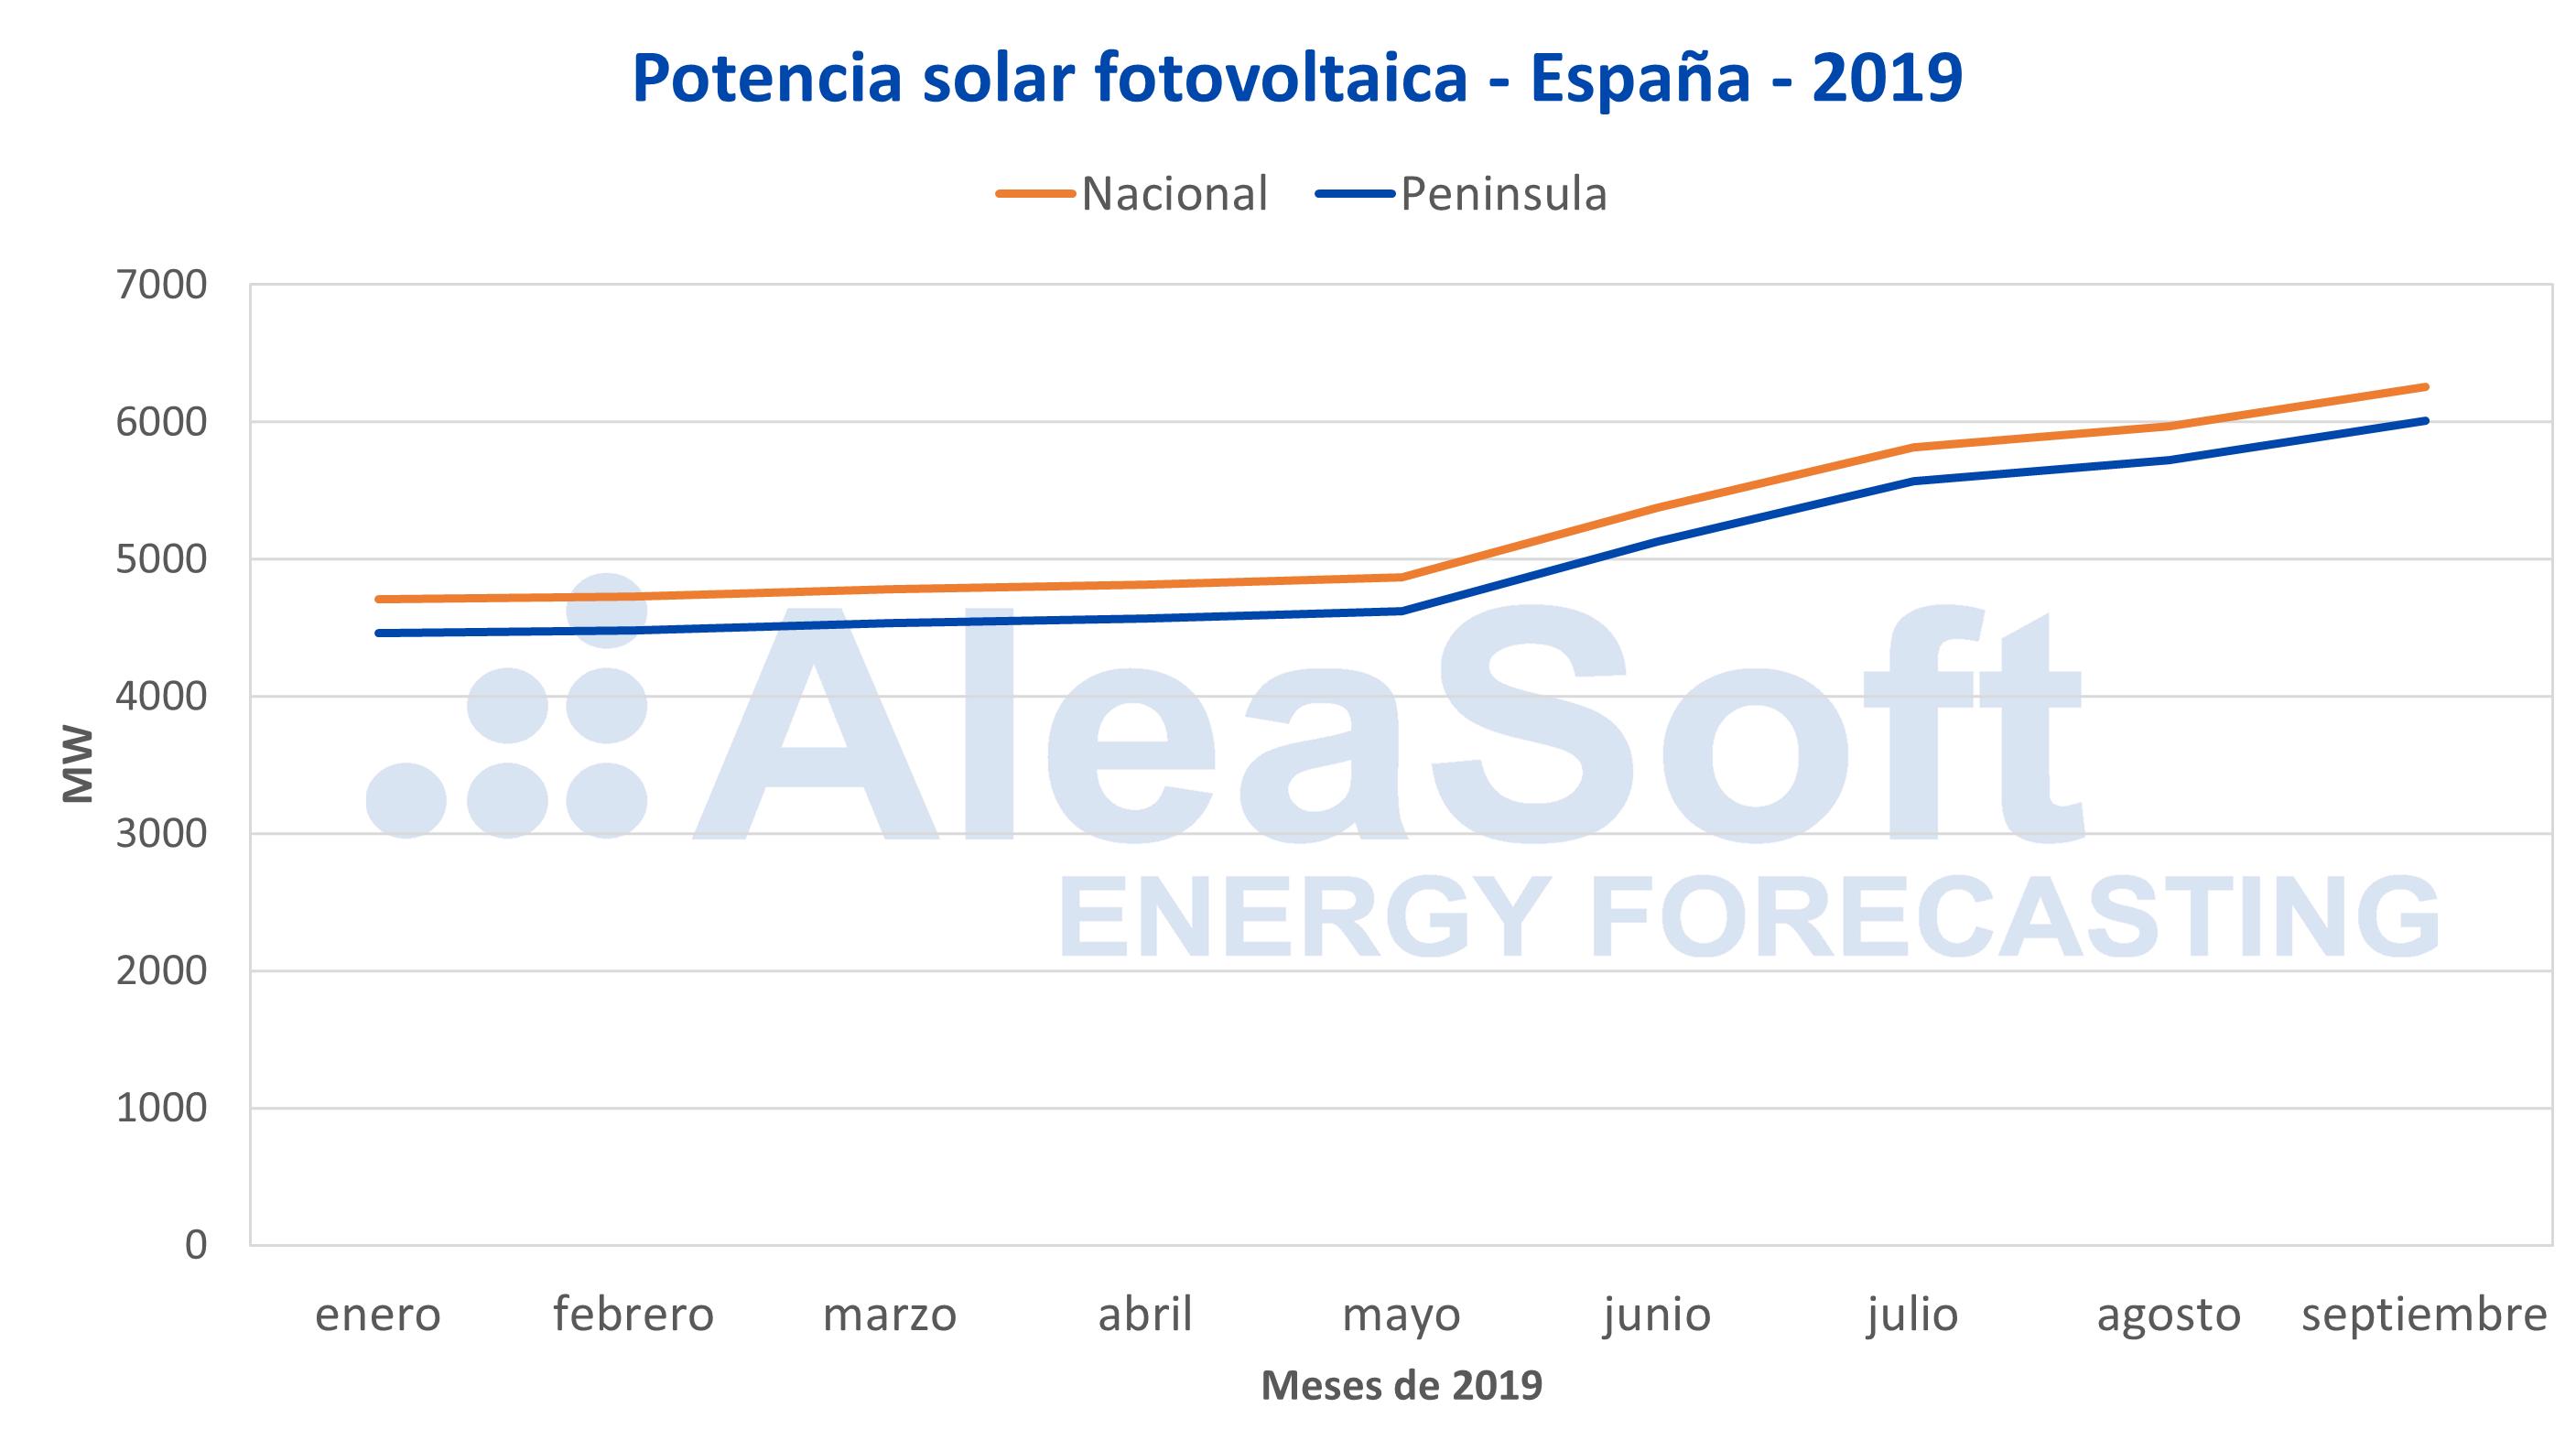 AleaSoft - Potencia fotovoltaica instalada España